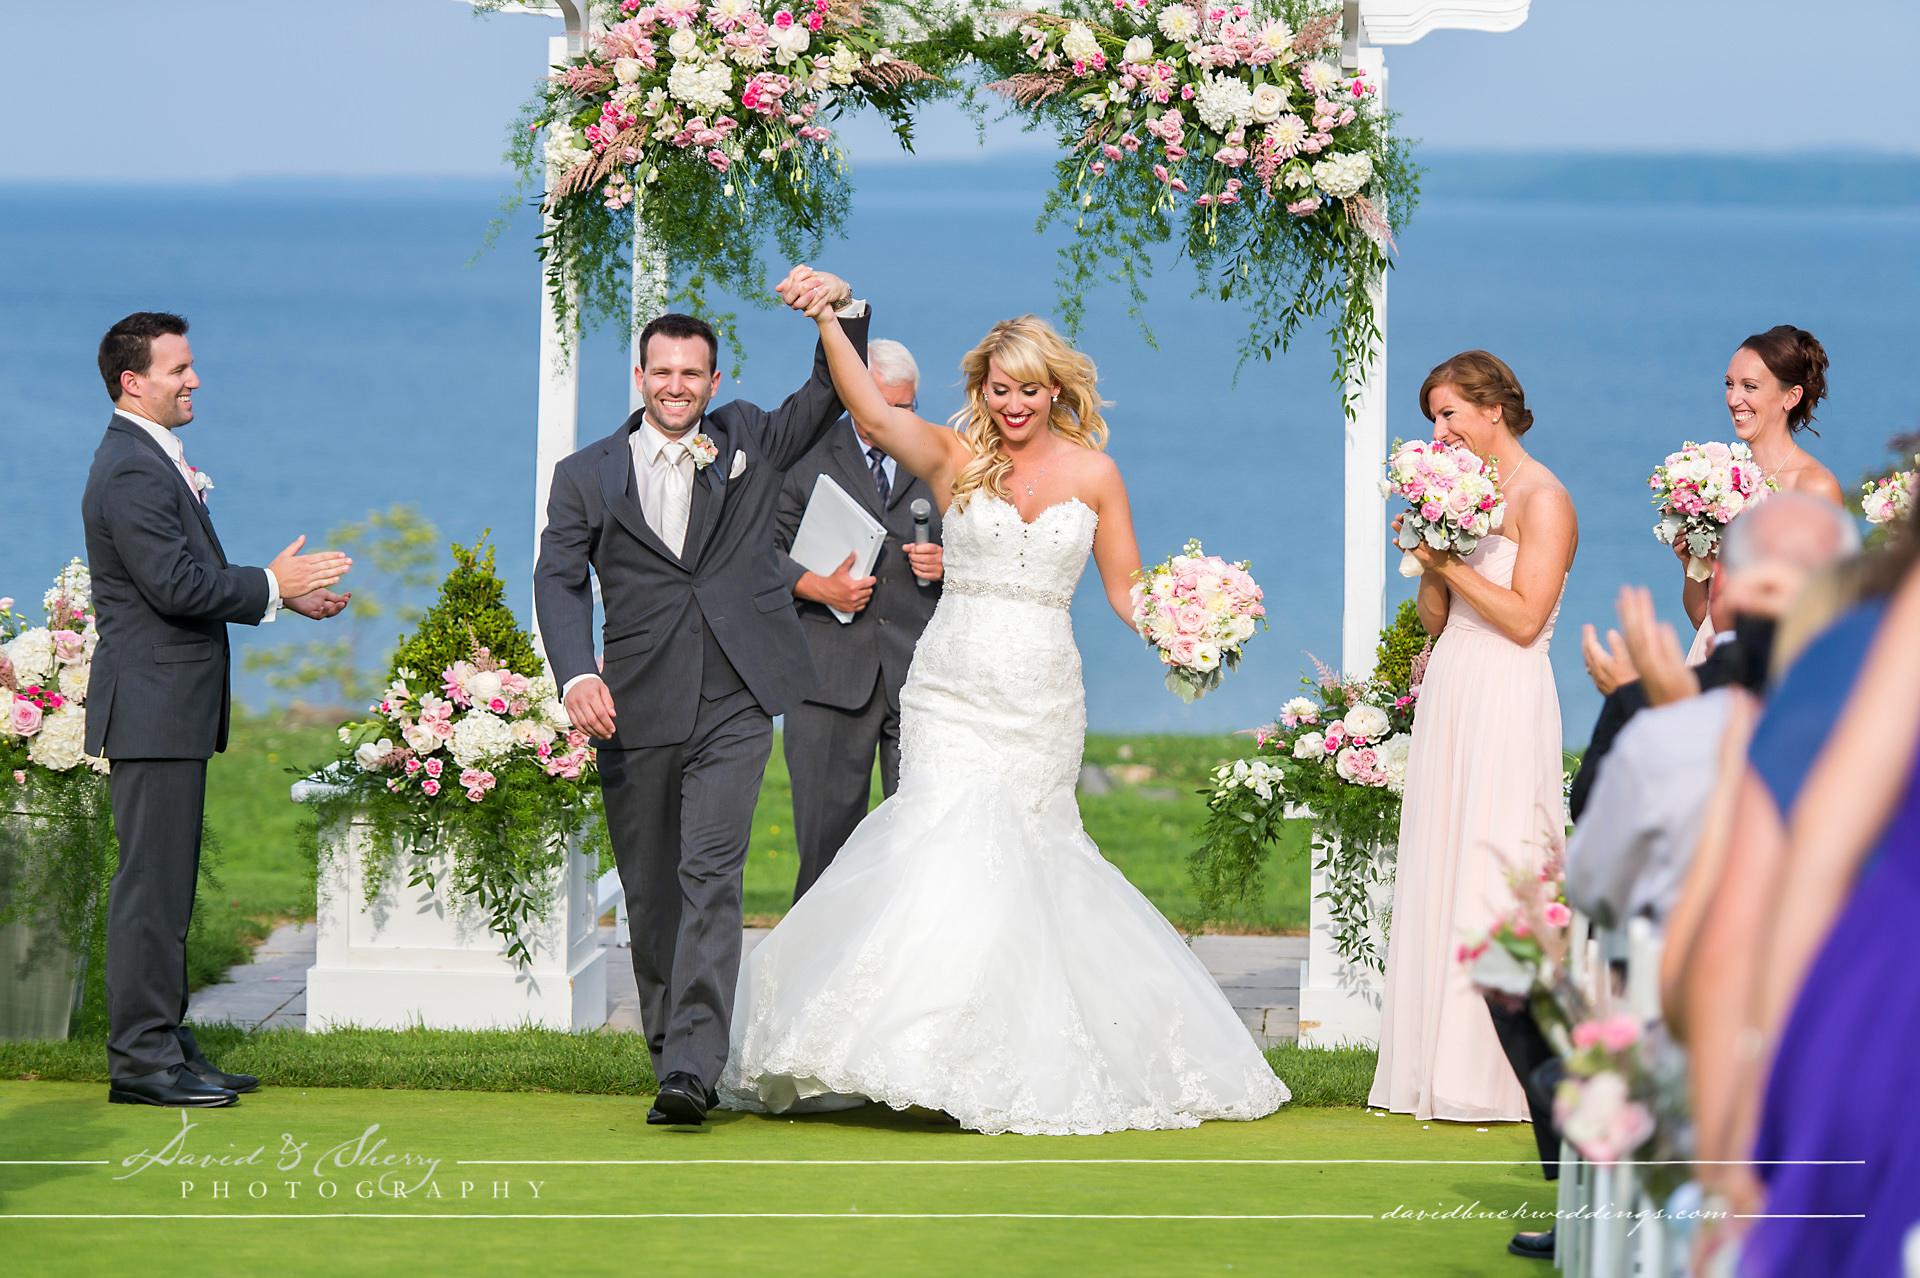 Cobble_Beach_Wedding_Photography_026